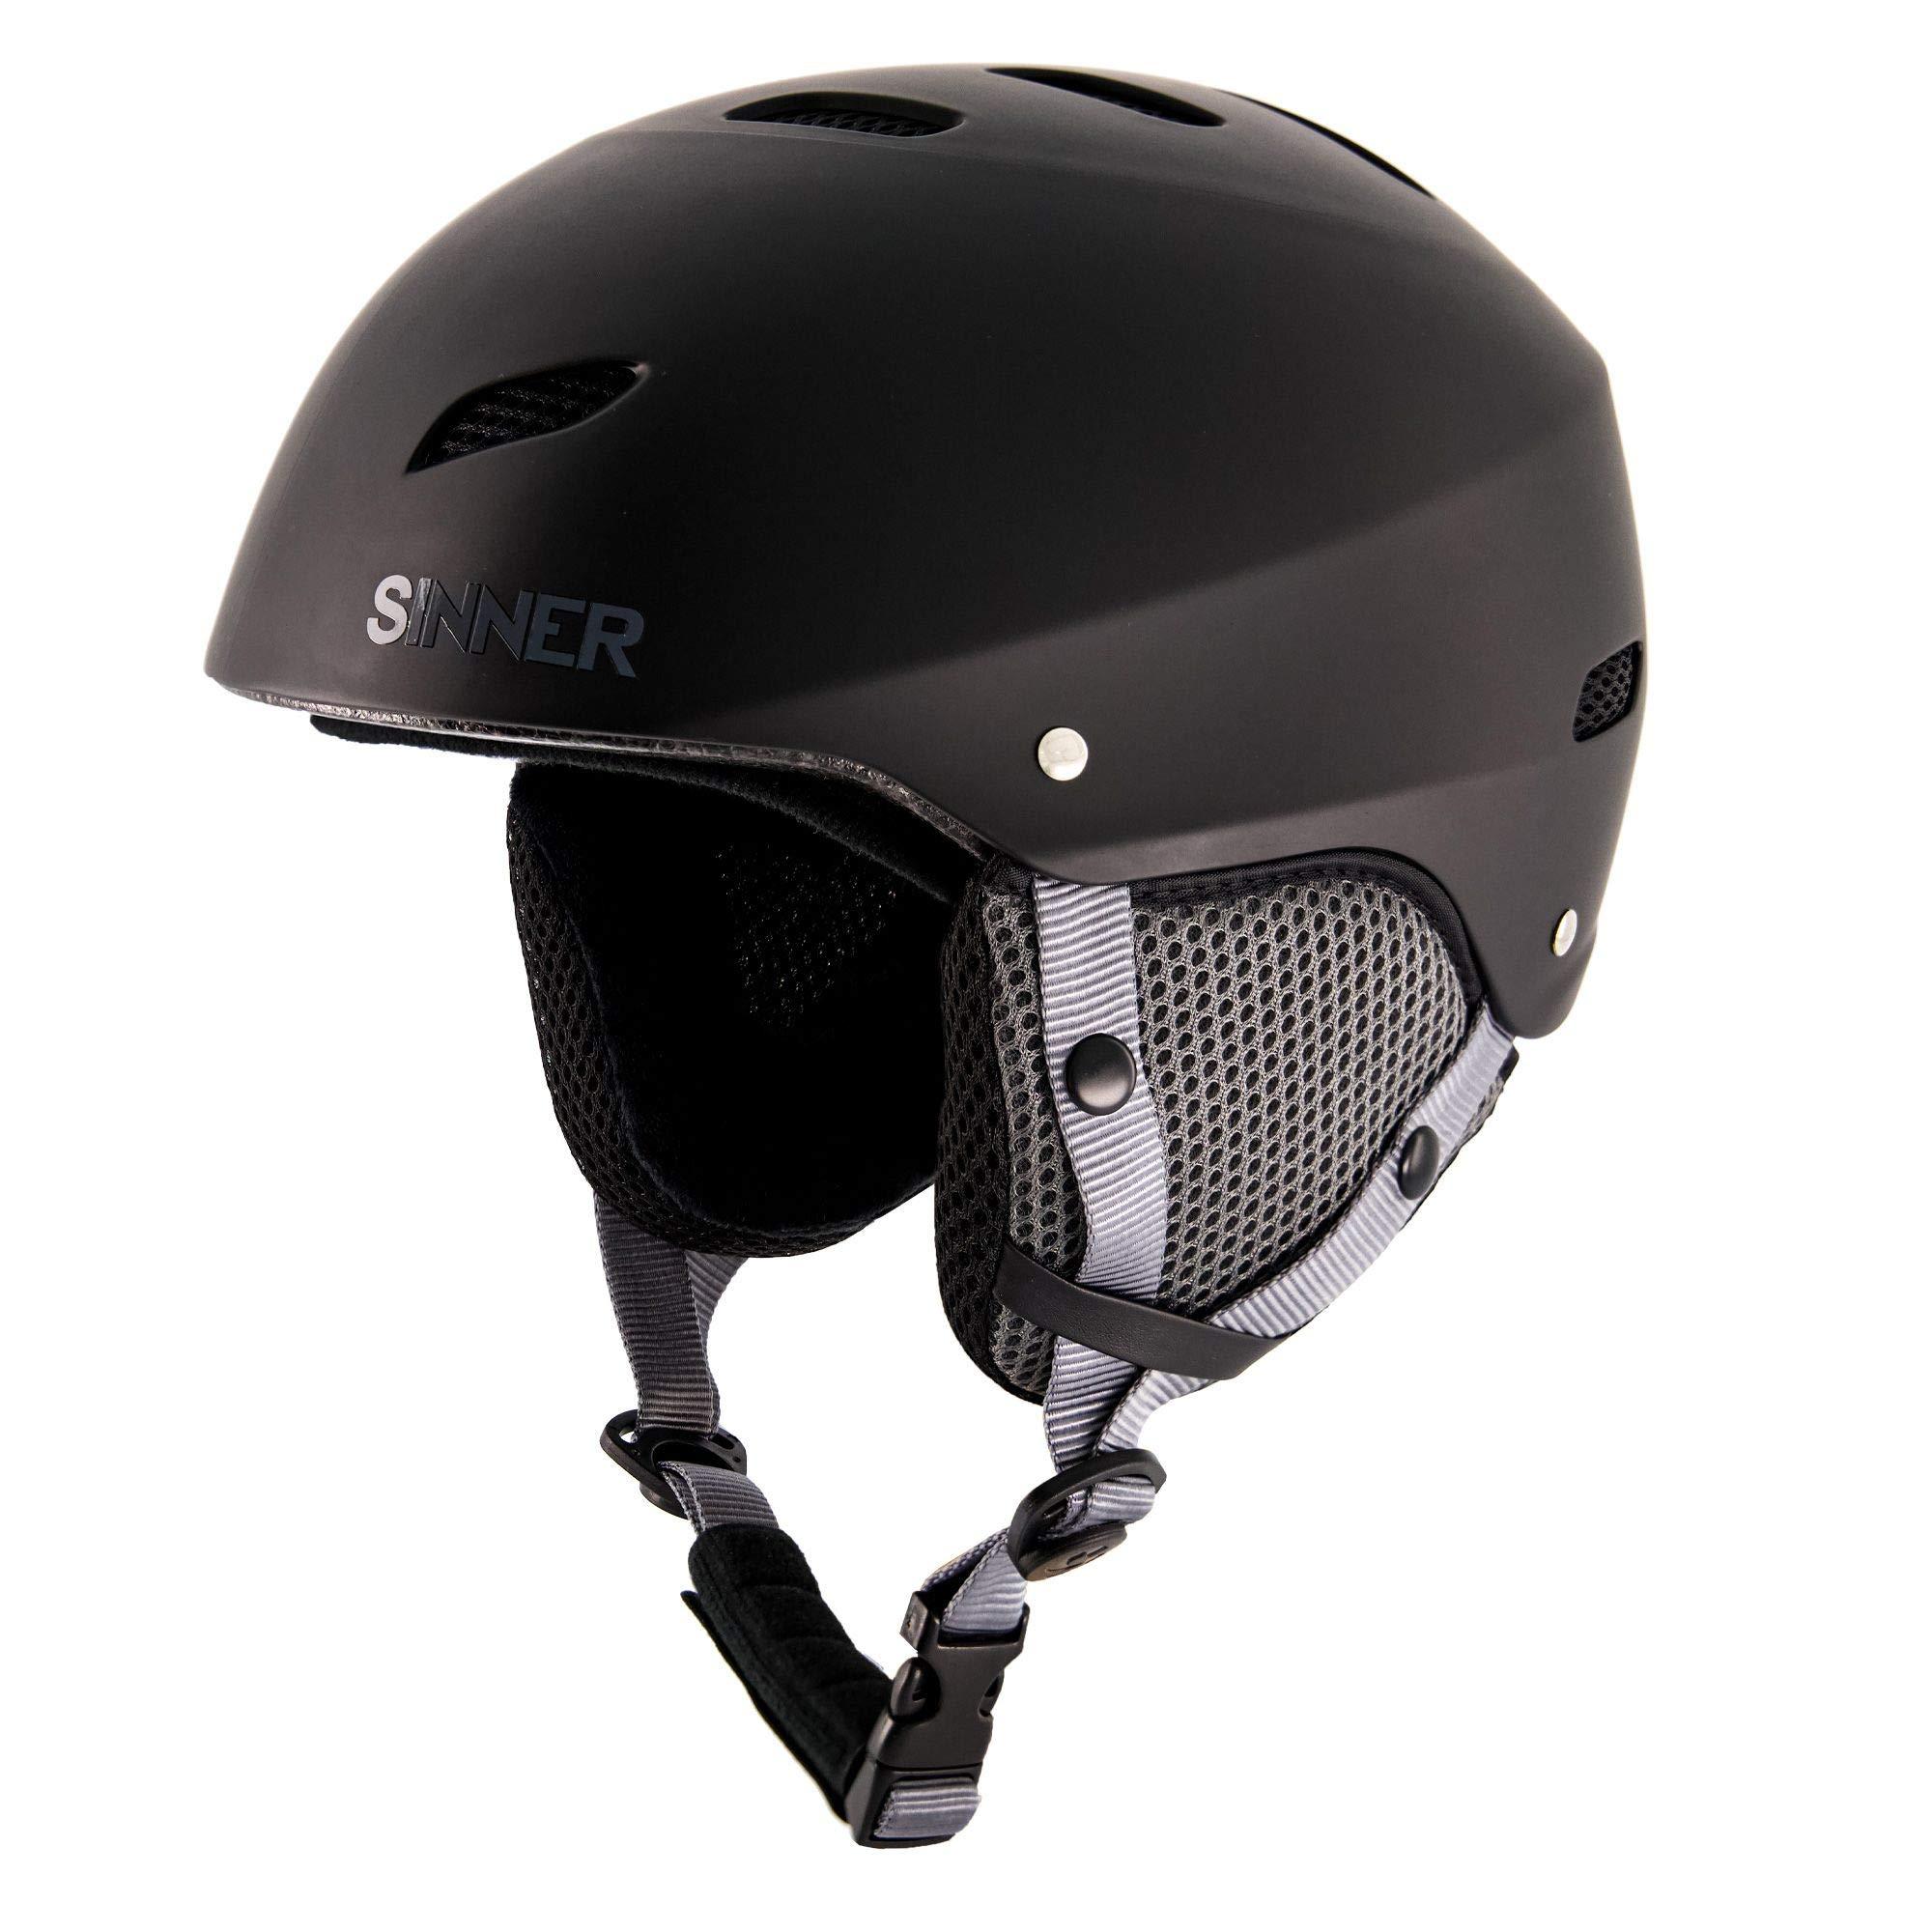 Sinner Ski & Snowboard Helmet